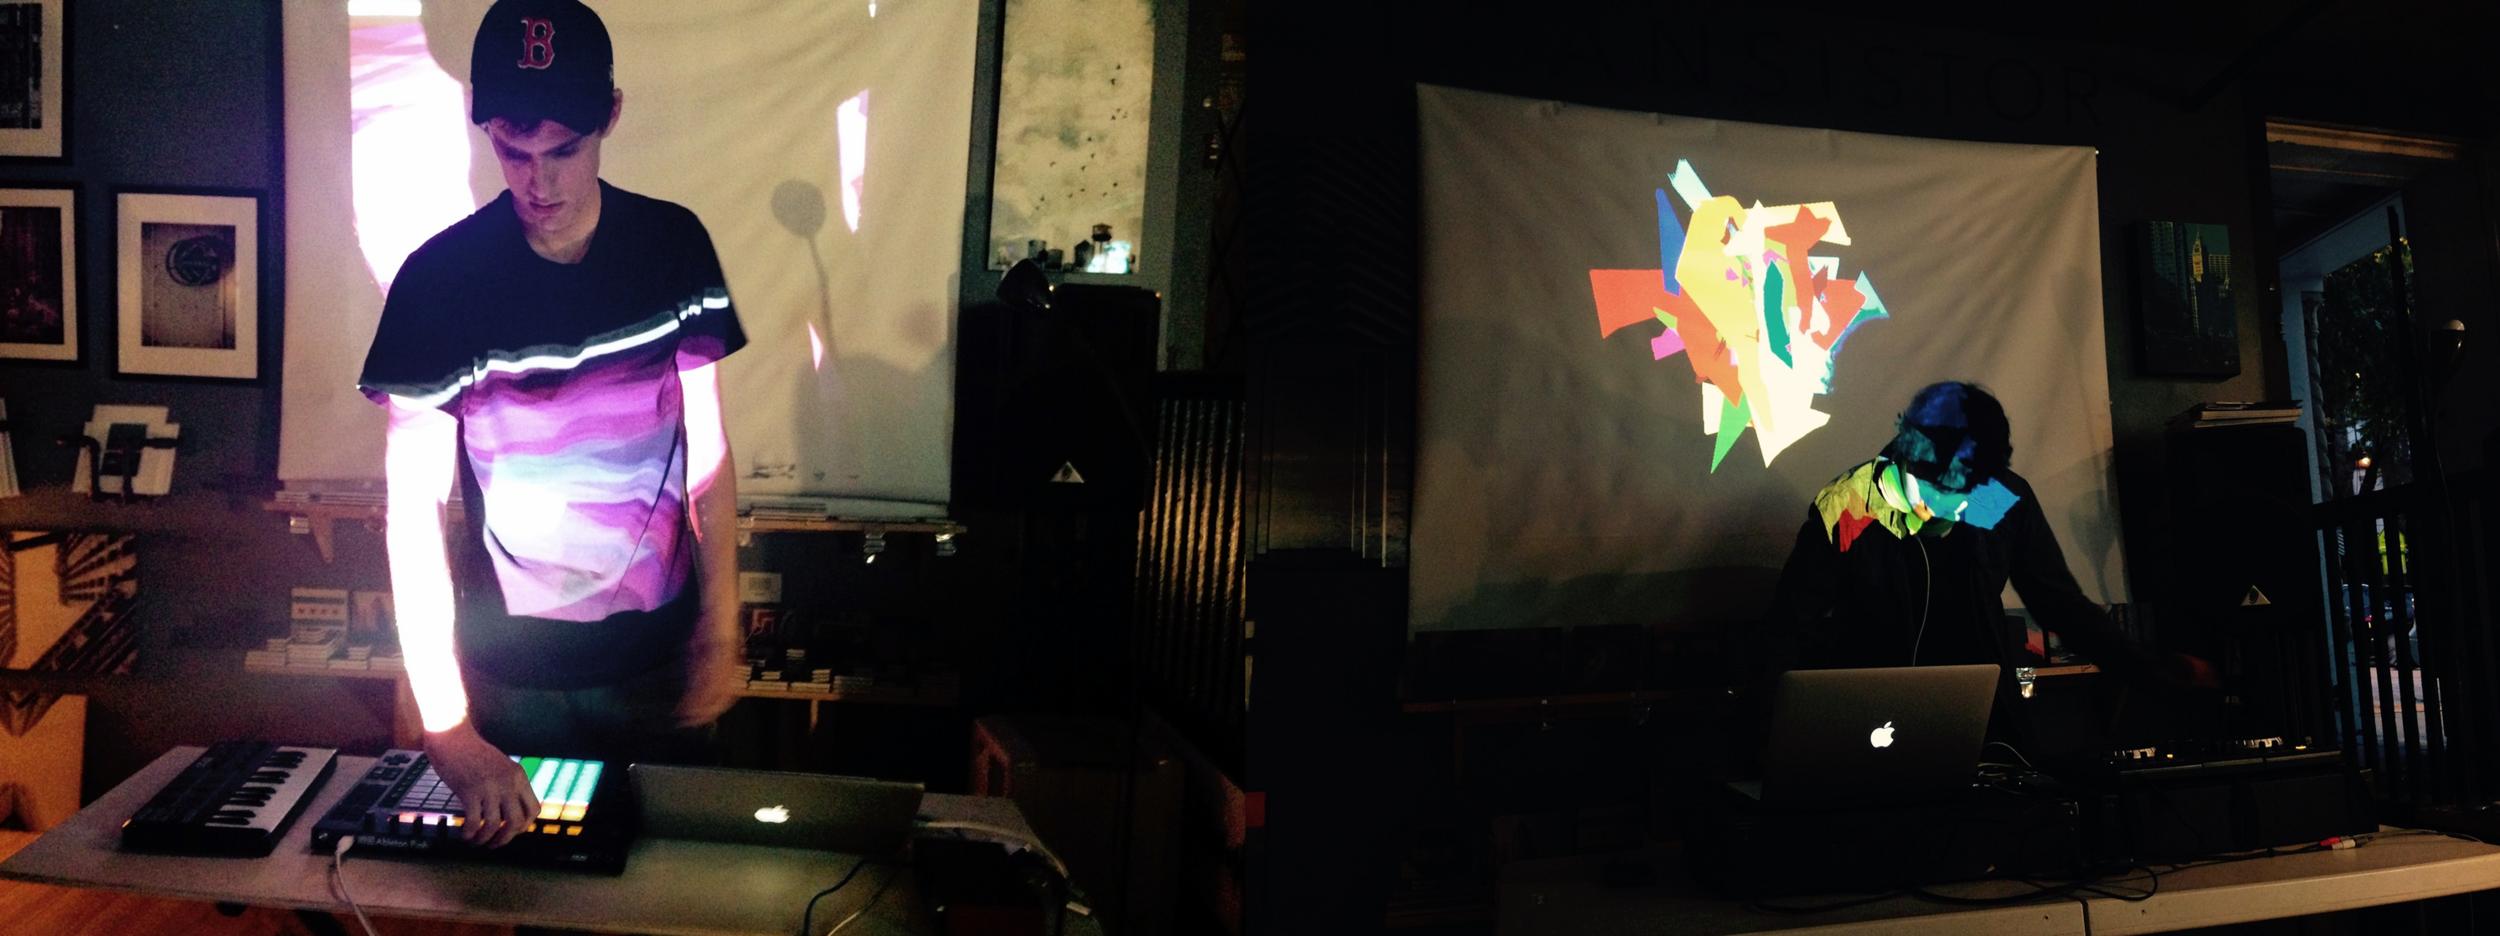 Friday night live at Transistor:  Marsden Giolas  and  Tetra f(x) .   Read more